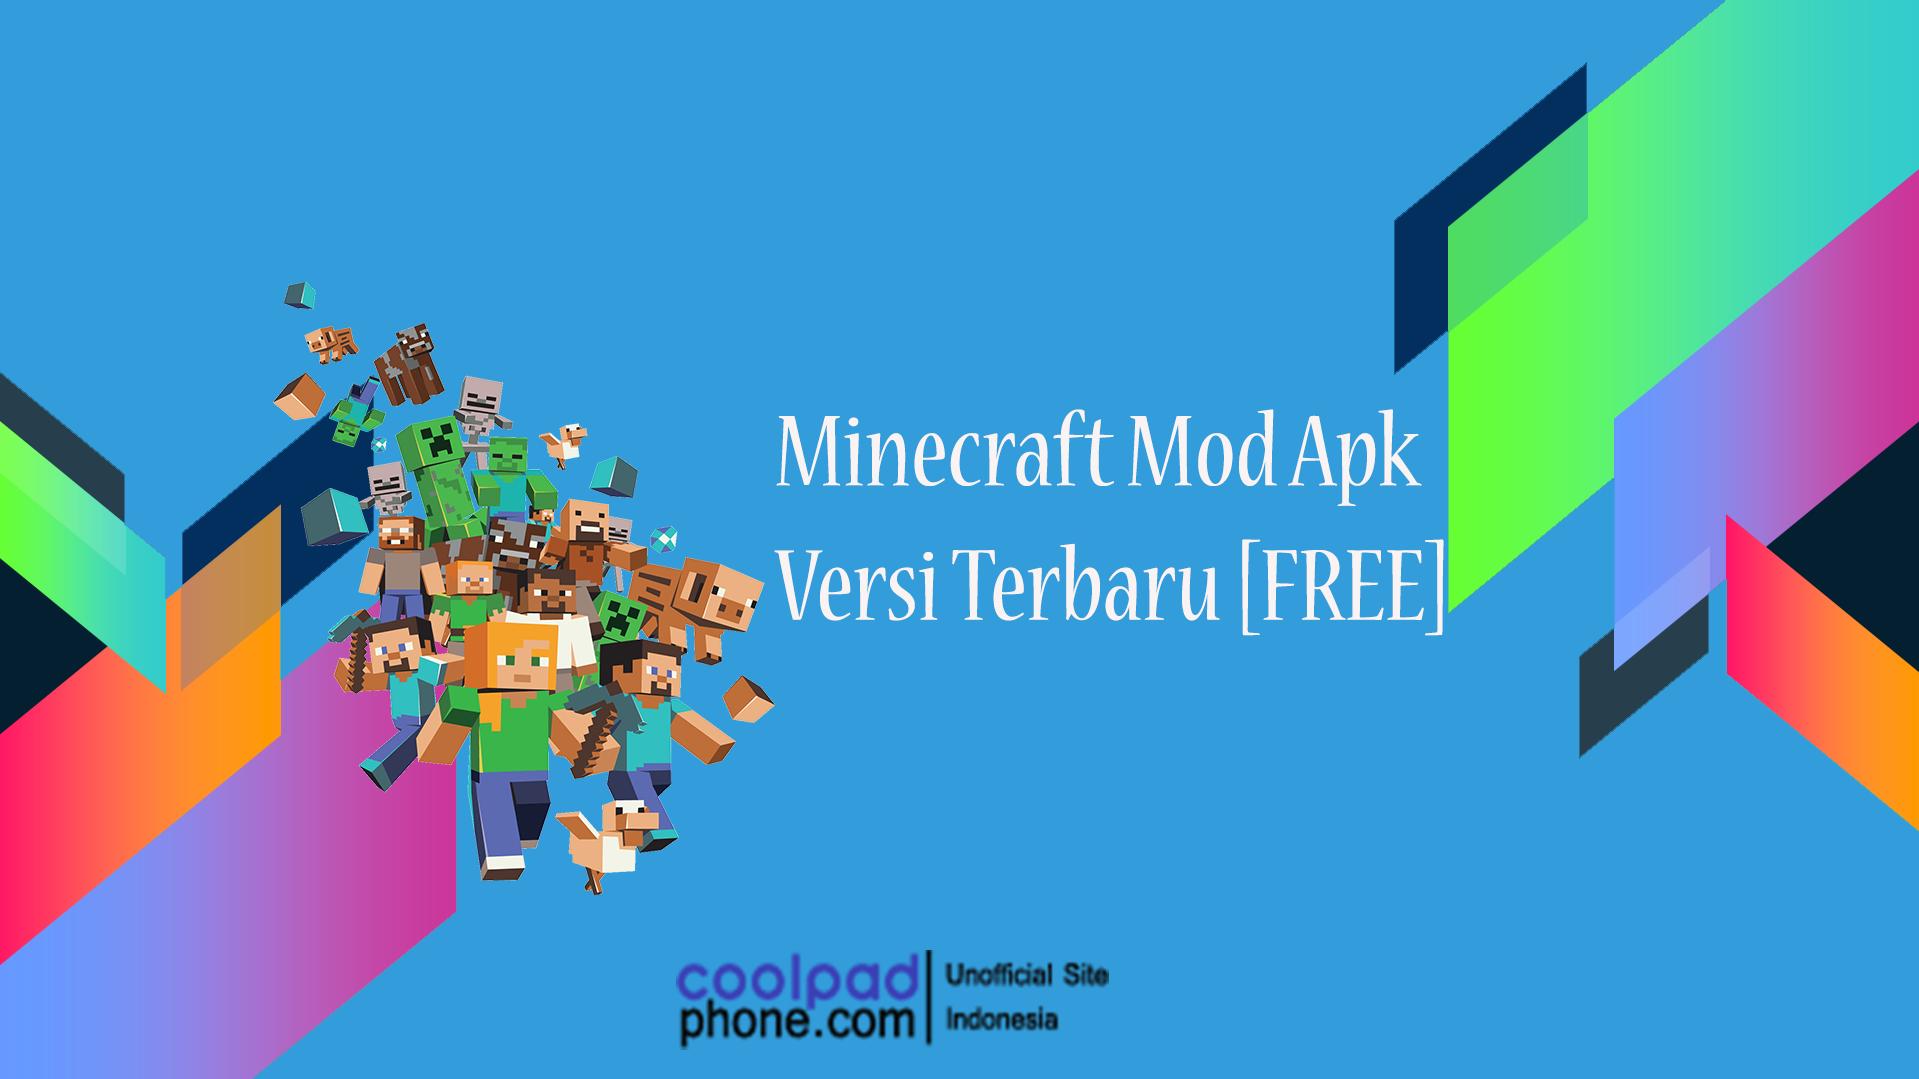 Minecraft Mod Apk Versi Terbaru [FREE] - CoolPadPhone.com